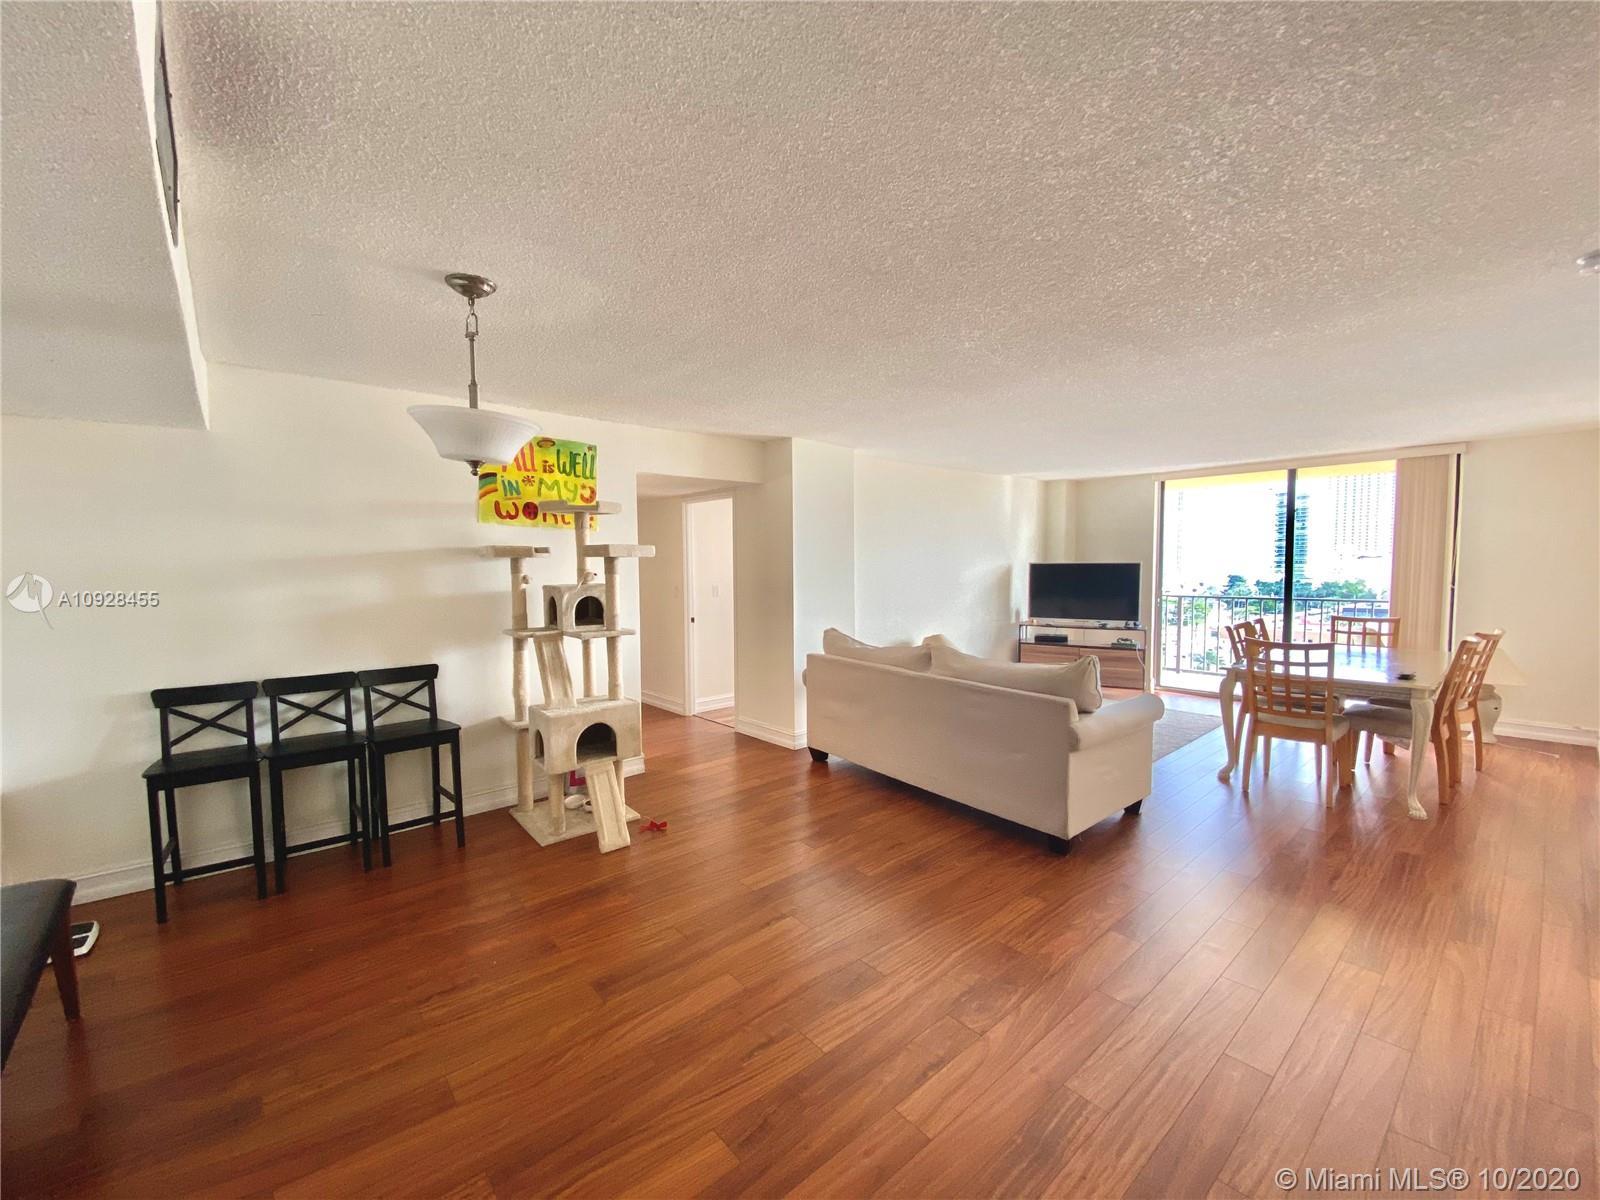 Winston Tower 600 #1205 - 210 174th St #1205, Sunny Isles Beach, FL 33160